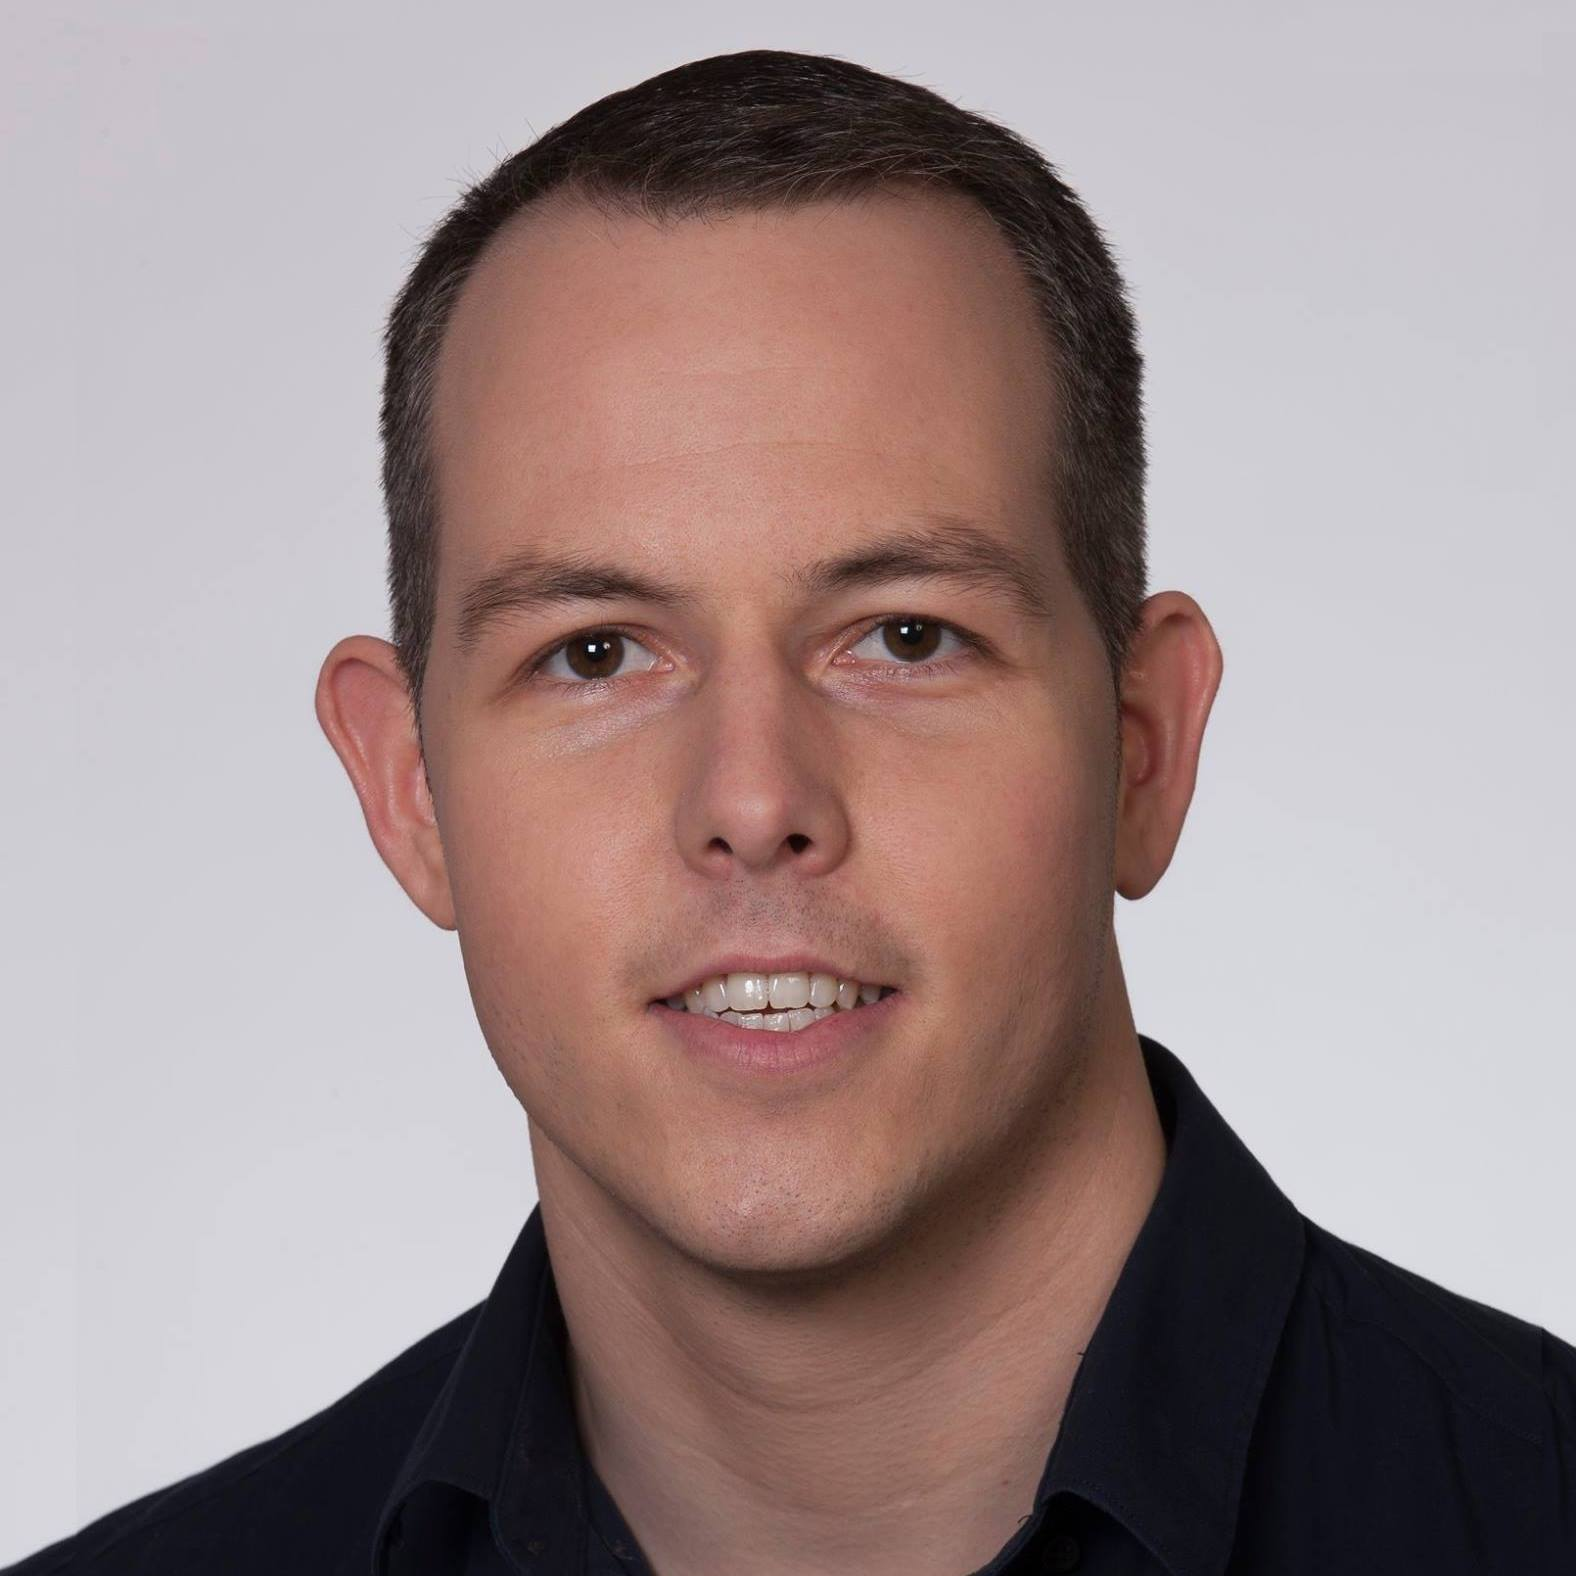 Stefan Amrein